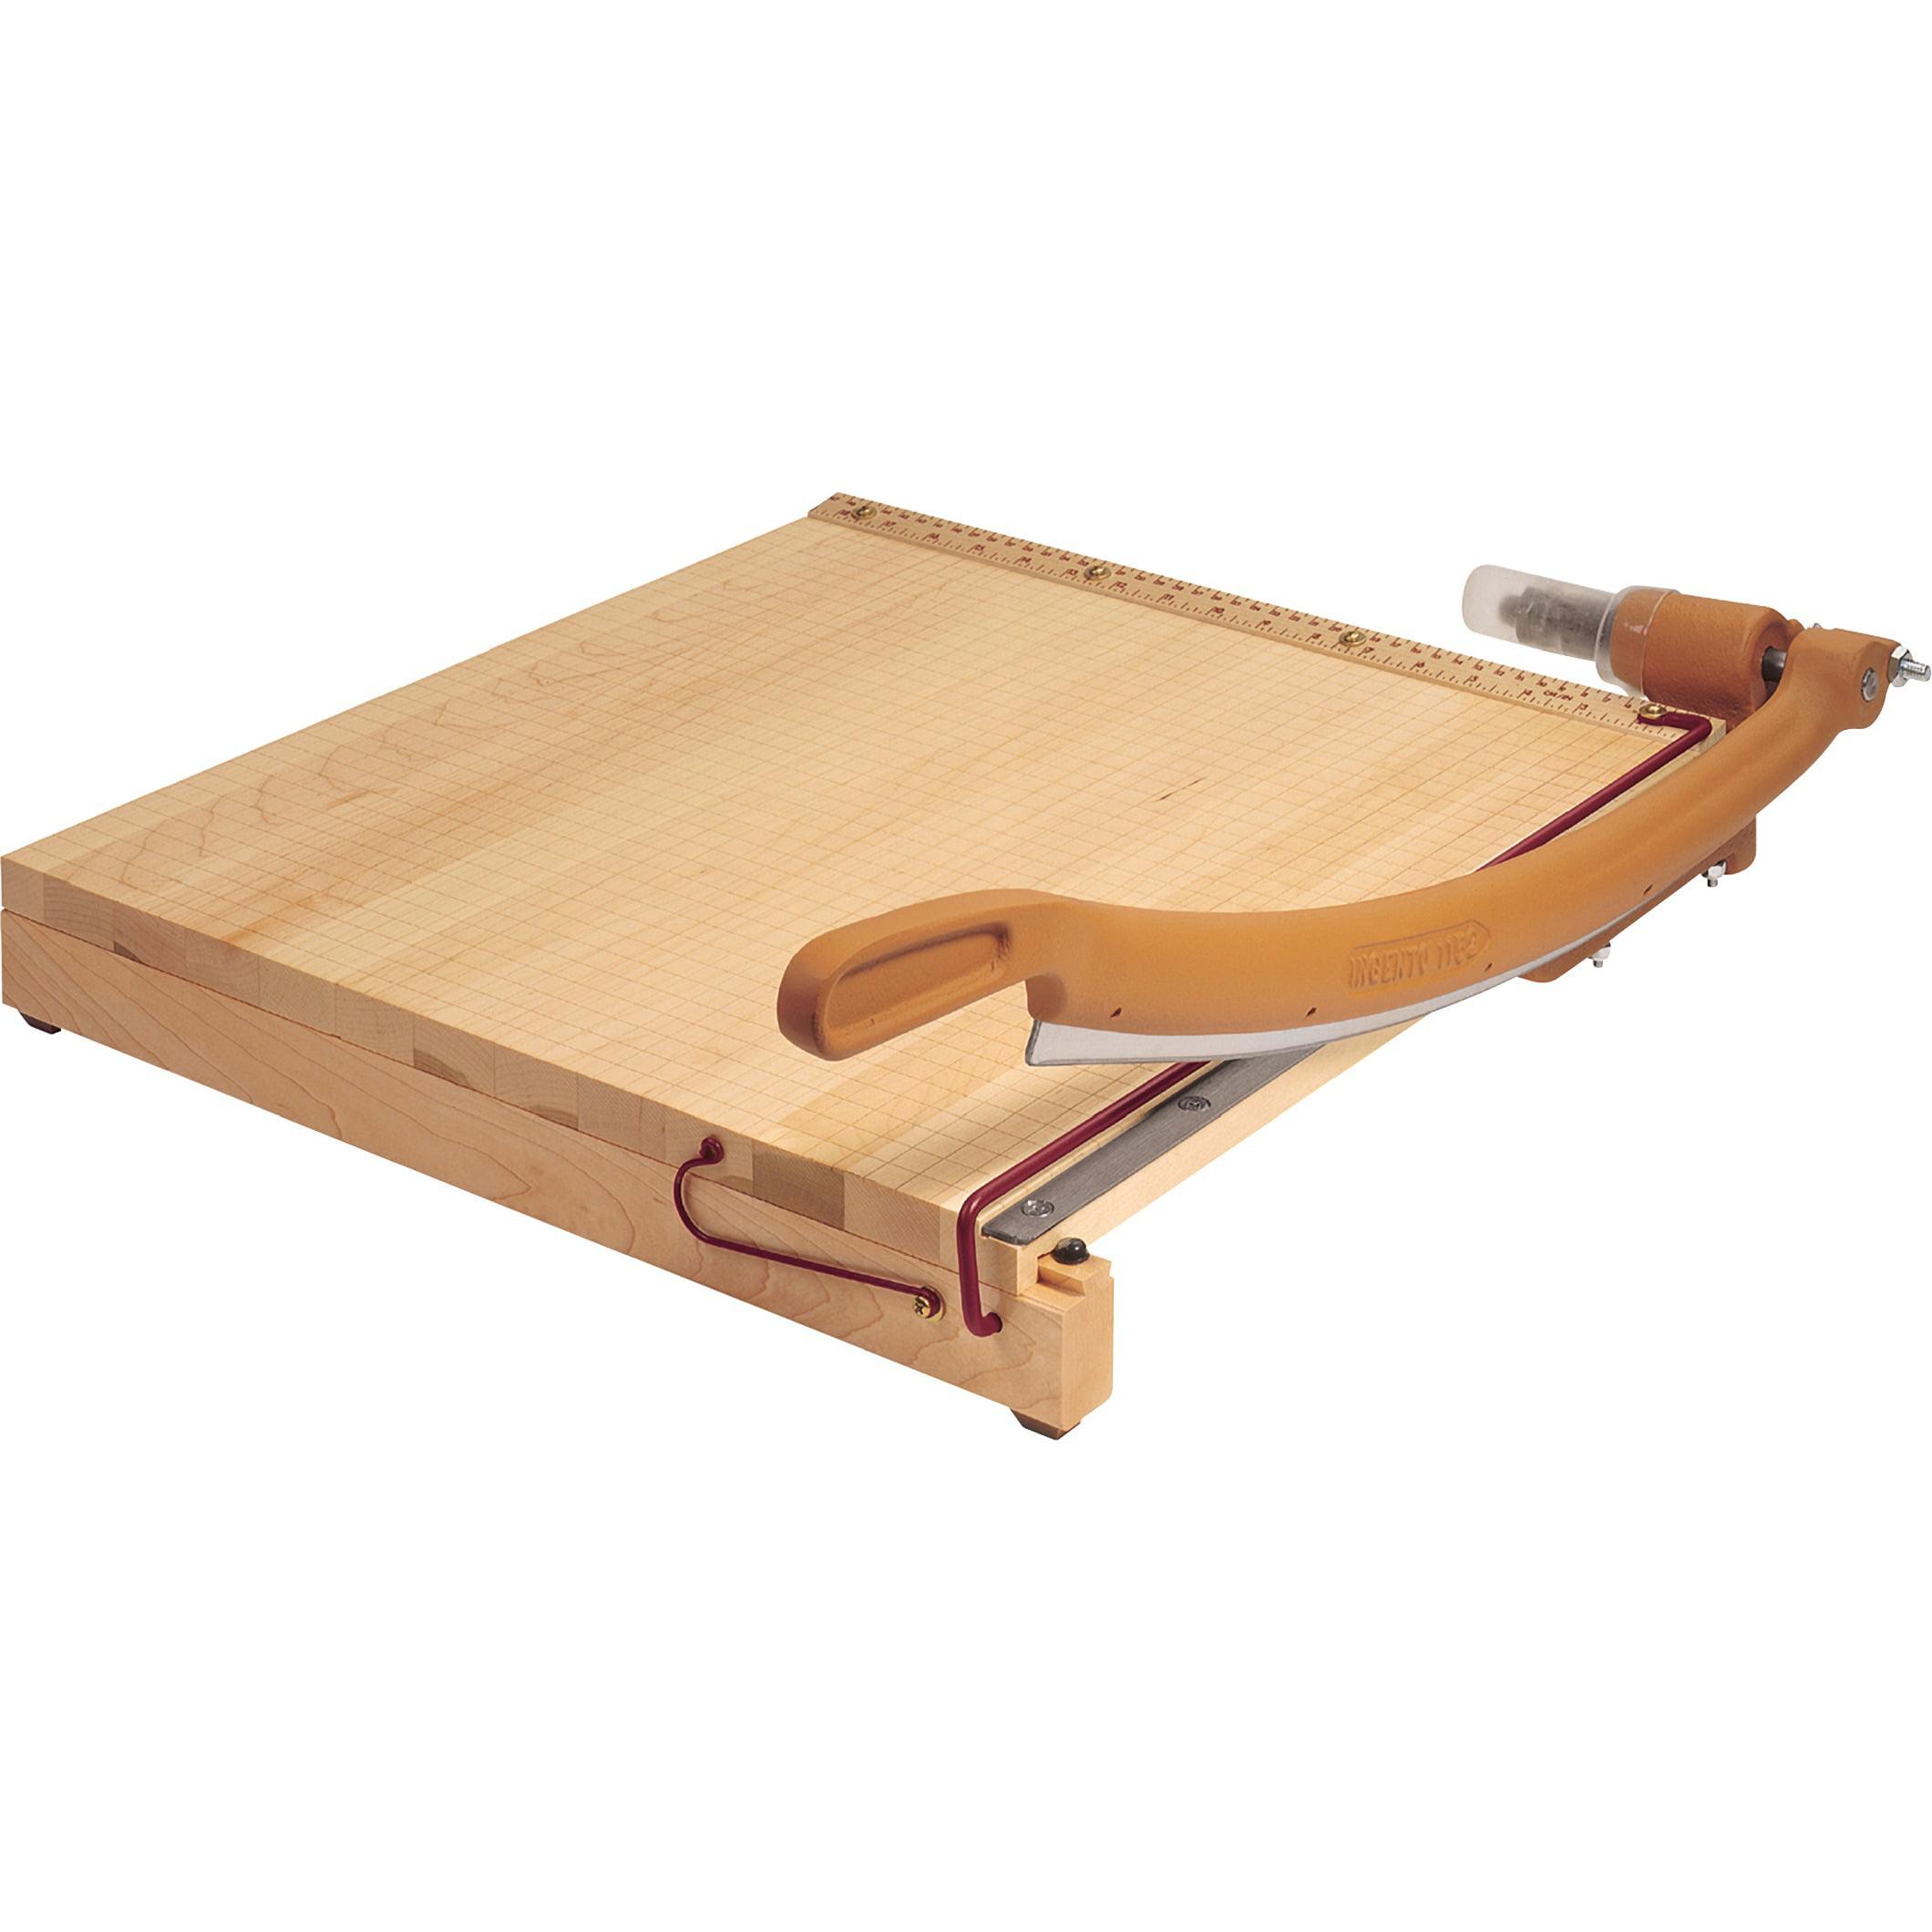 "Swingline ClassicCut Igento 15"" Square Paper Trimmer, Solid Maple base by ACCO Brands Corporation"